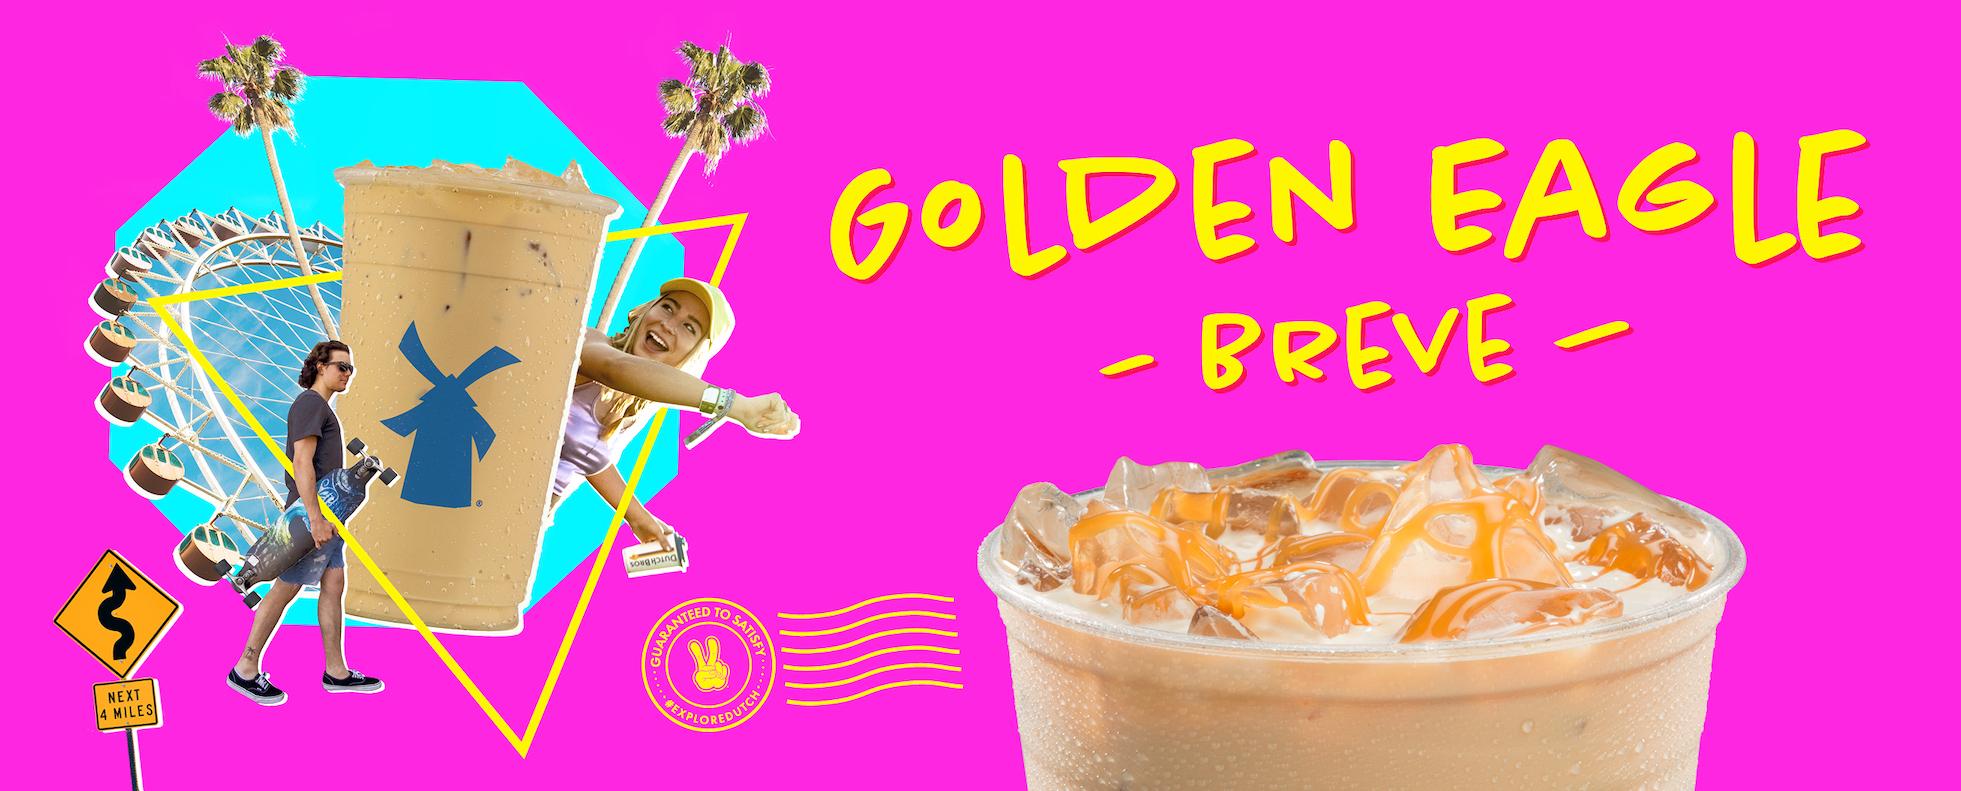 Golden Eagle Breve